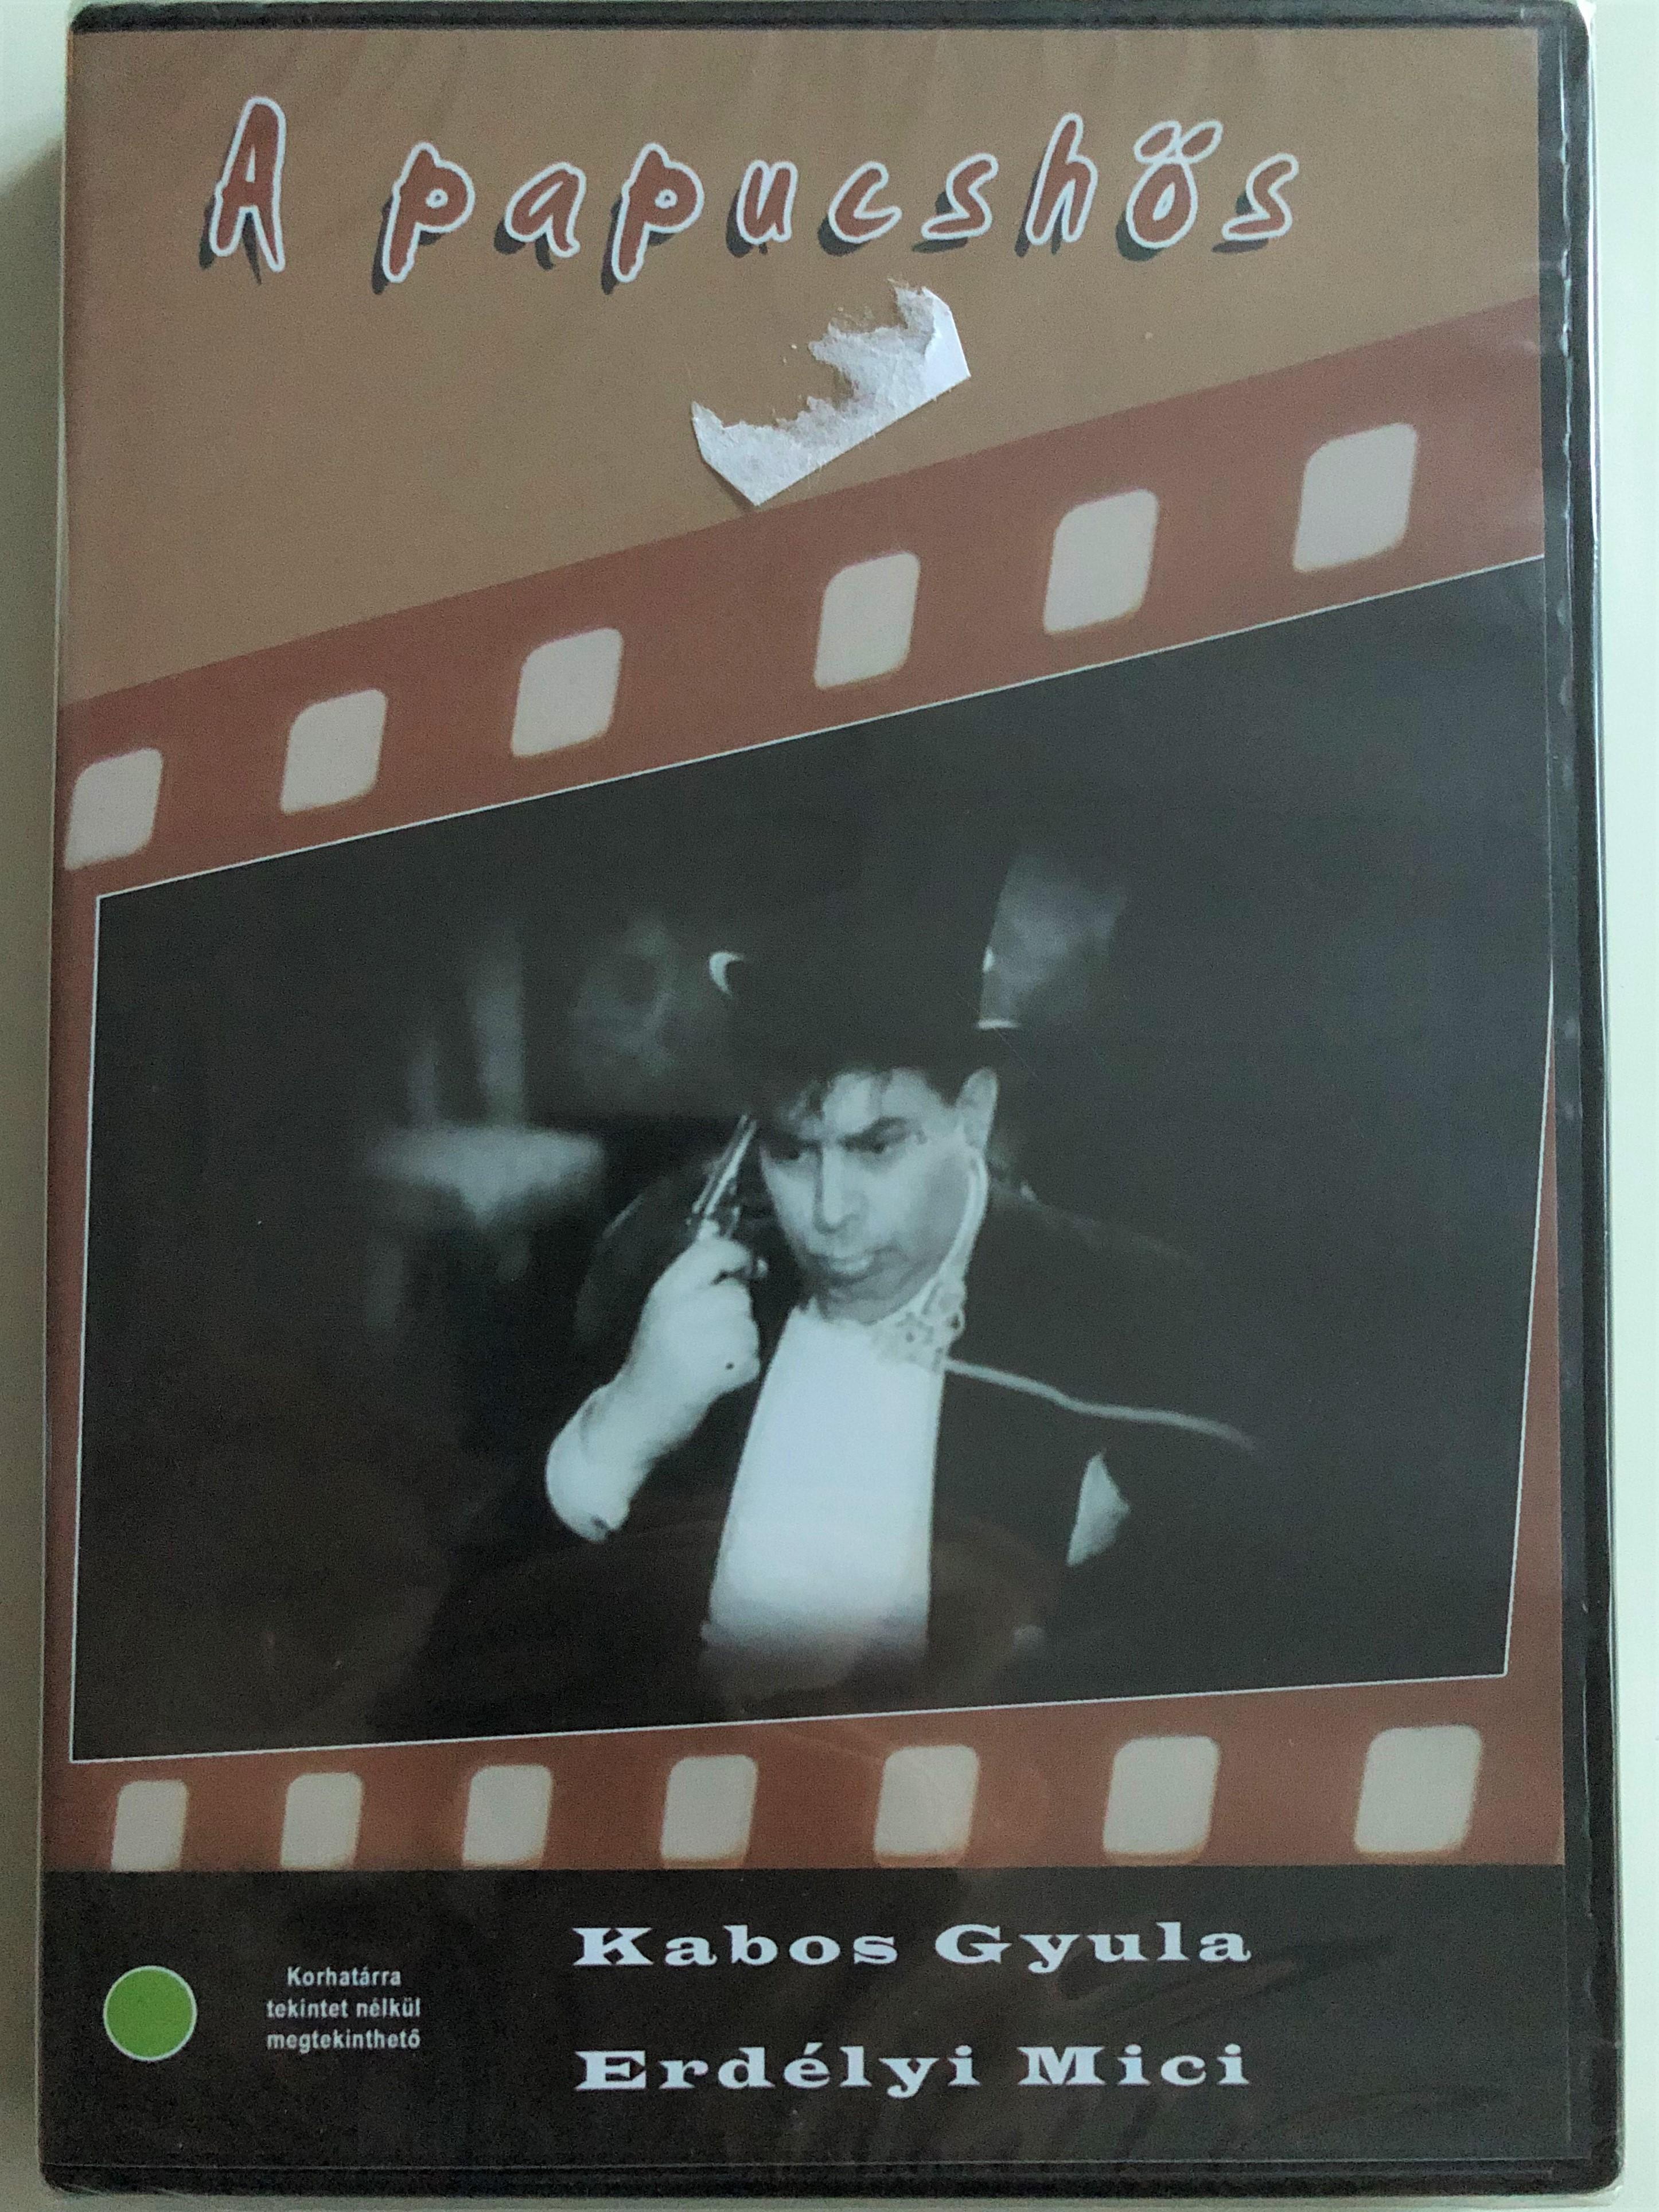 -a-papucsh-s-dvd-1938-directed-by-vaszary-j-nos-written-by-mih-ly-istv-n-starring-kabos-gyula-erd-lyi-mici-pethes-s-ndor-kert-sz-dezs-hungarian-b-w-classic-1-.jpg